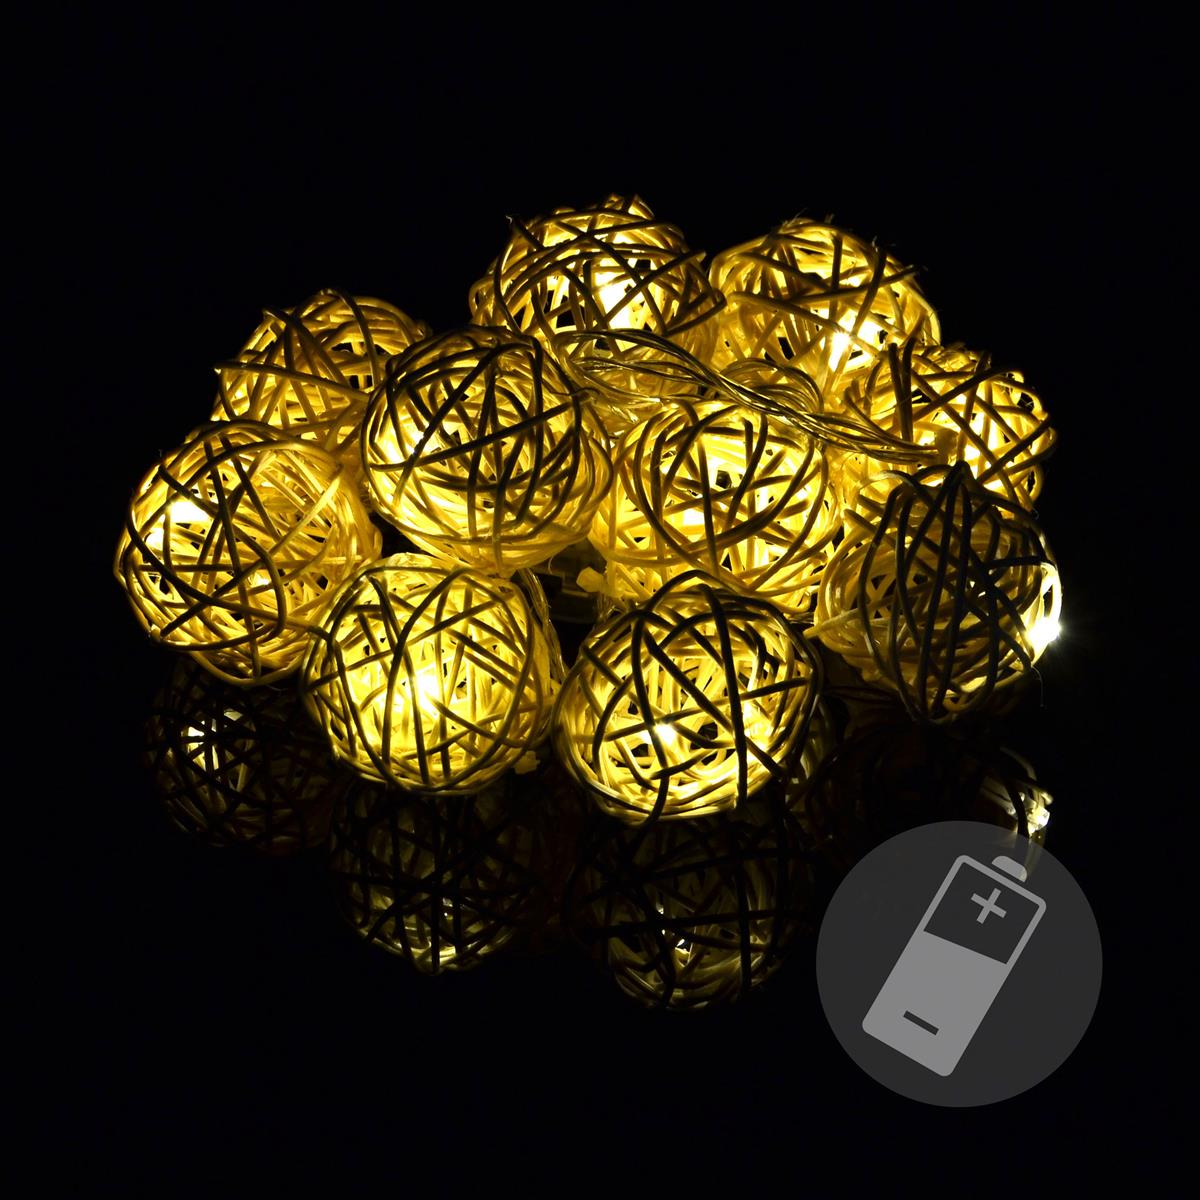 10 LED Kugel-Lichterkette Ball Rattanoptik Rattan Lichterkette warmweiß Batterie